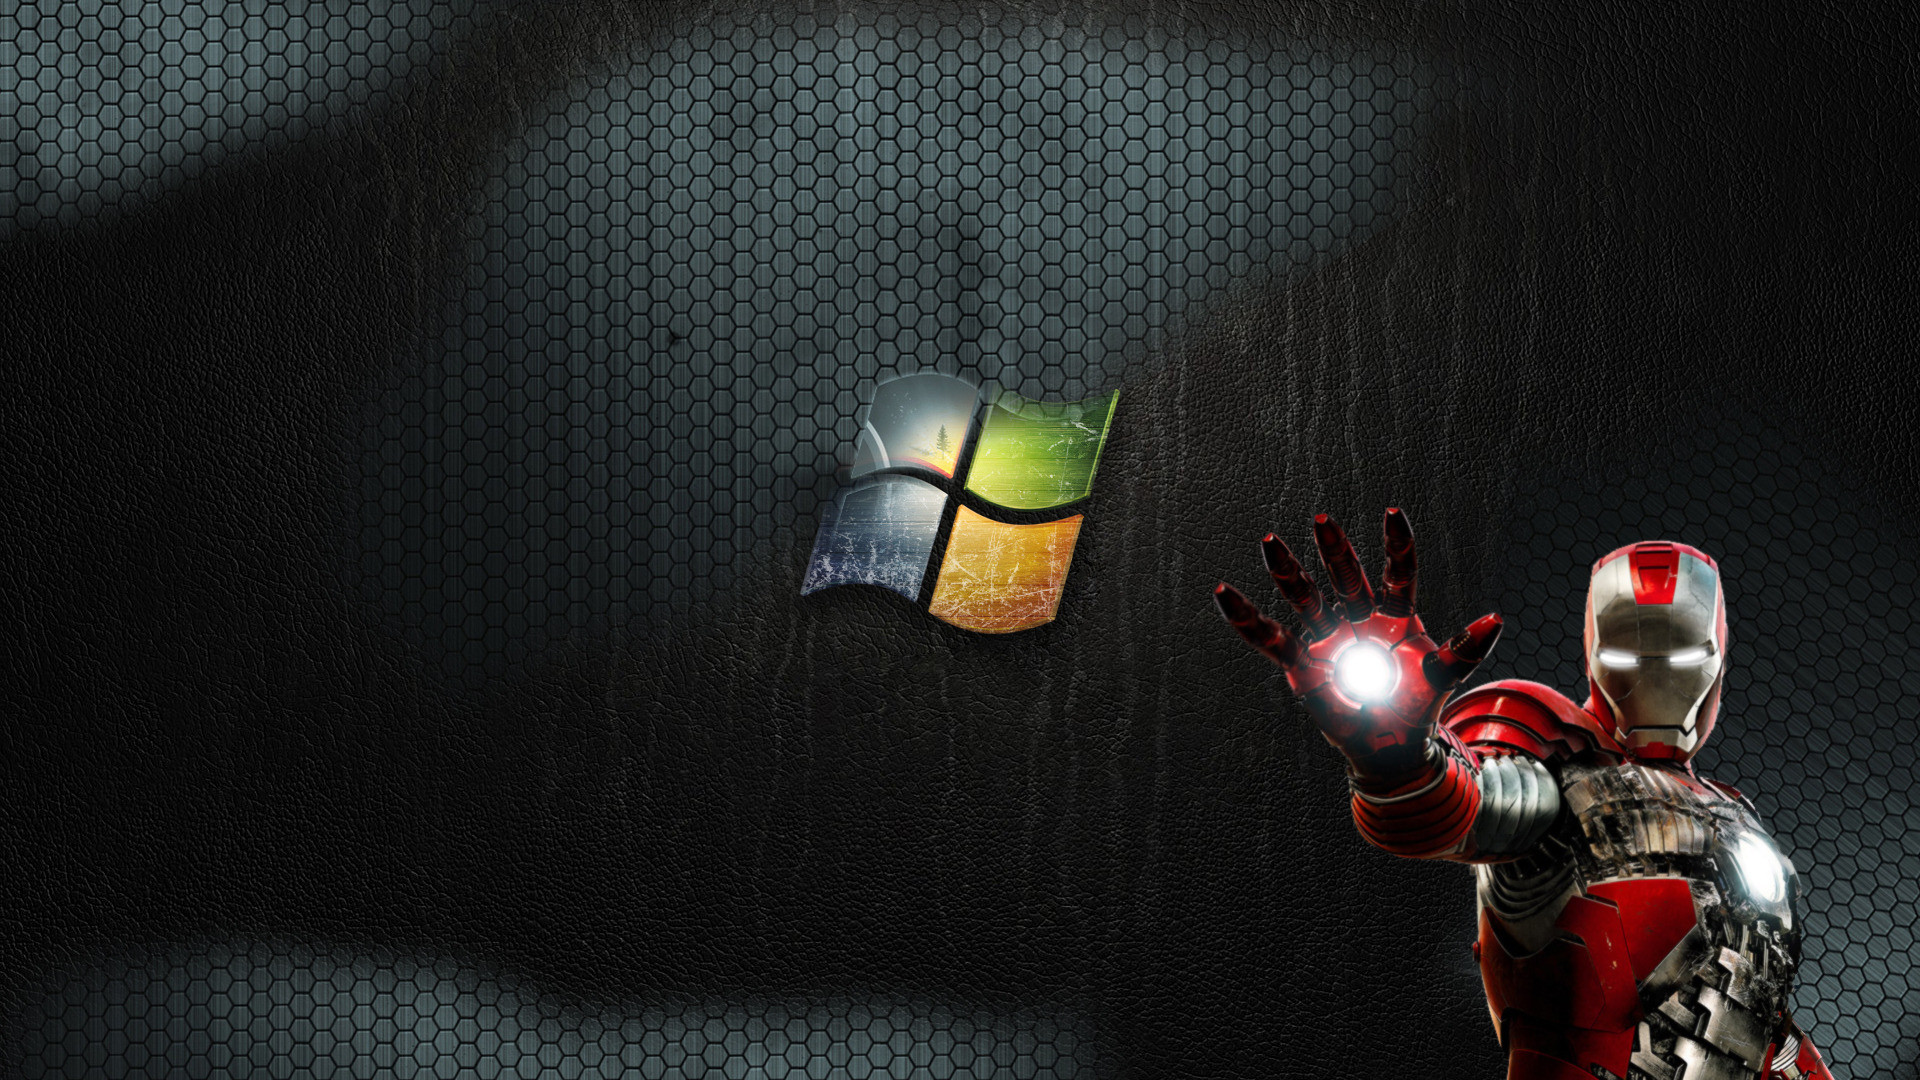 Iron man jarvis animated wallpaper 79 images for Sfondi iron man